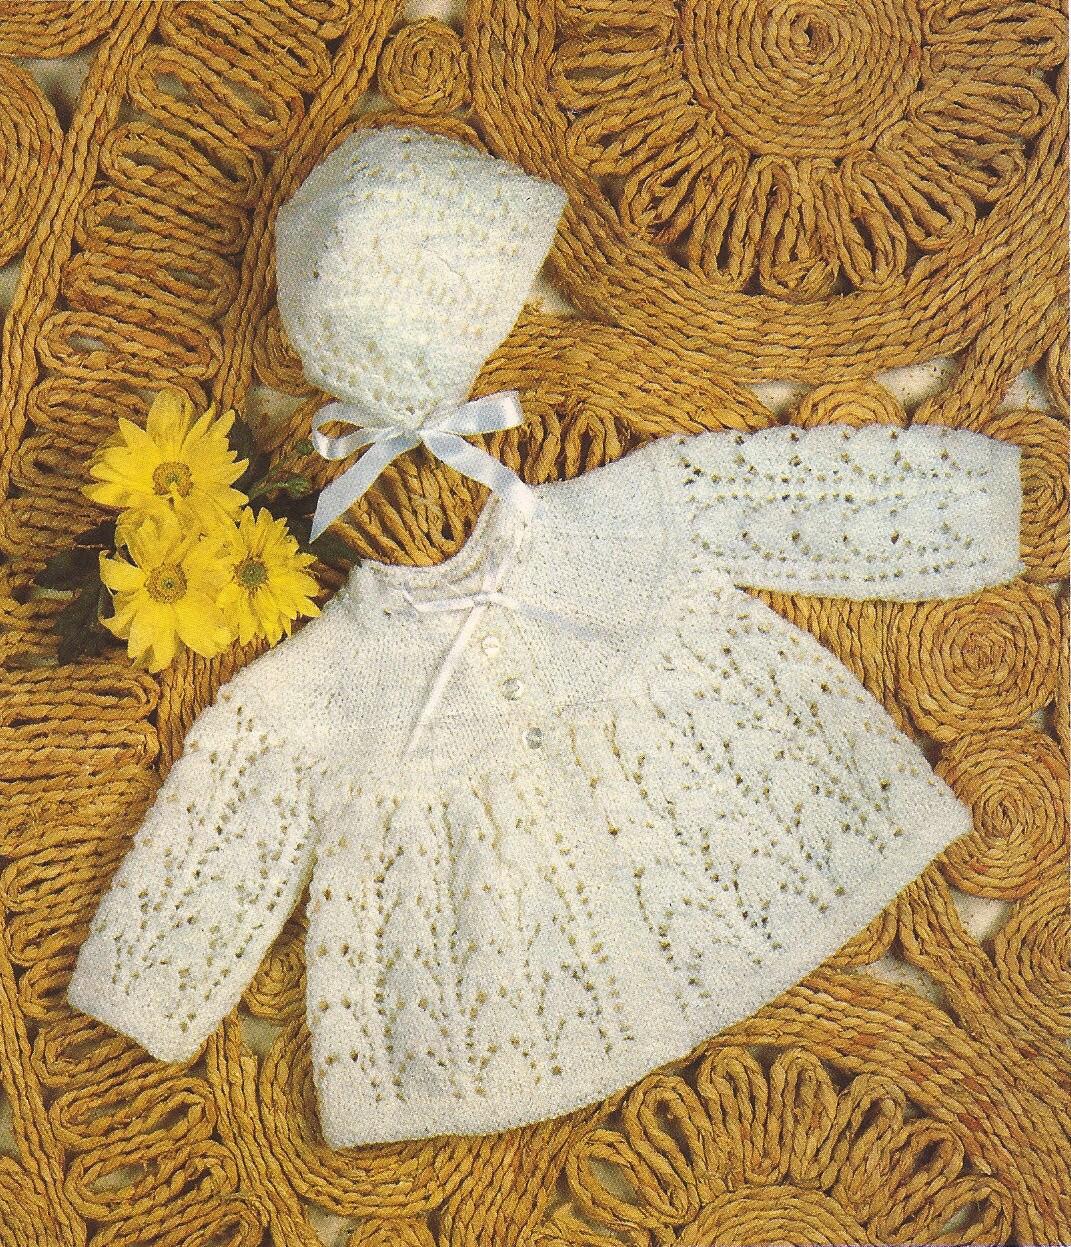 Baby Matinee Coat Knitting Patterns : Pdf knitting pattern baby matinee coat and bonnet by